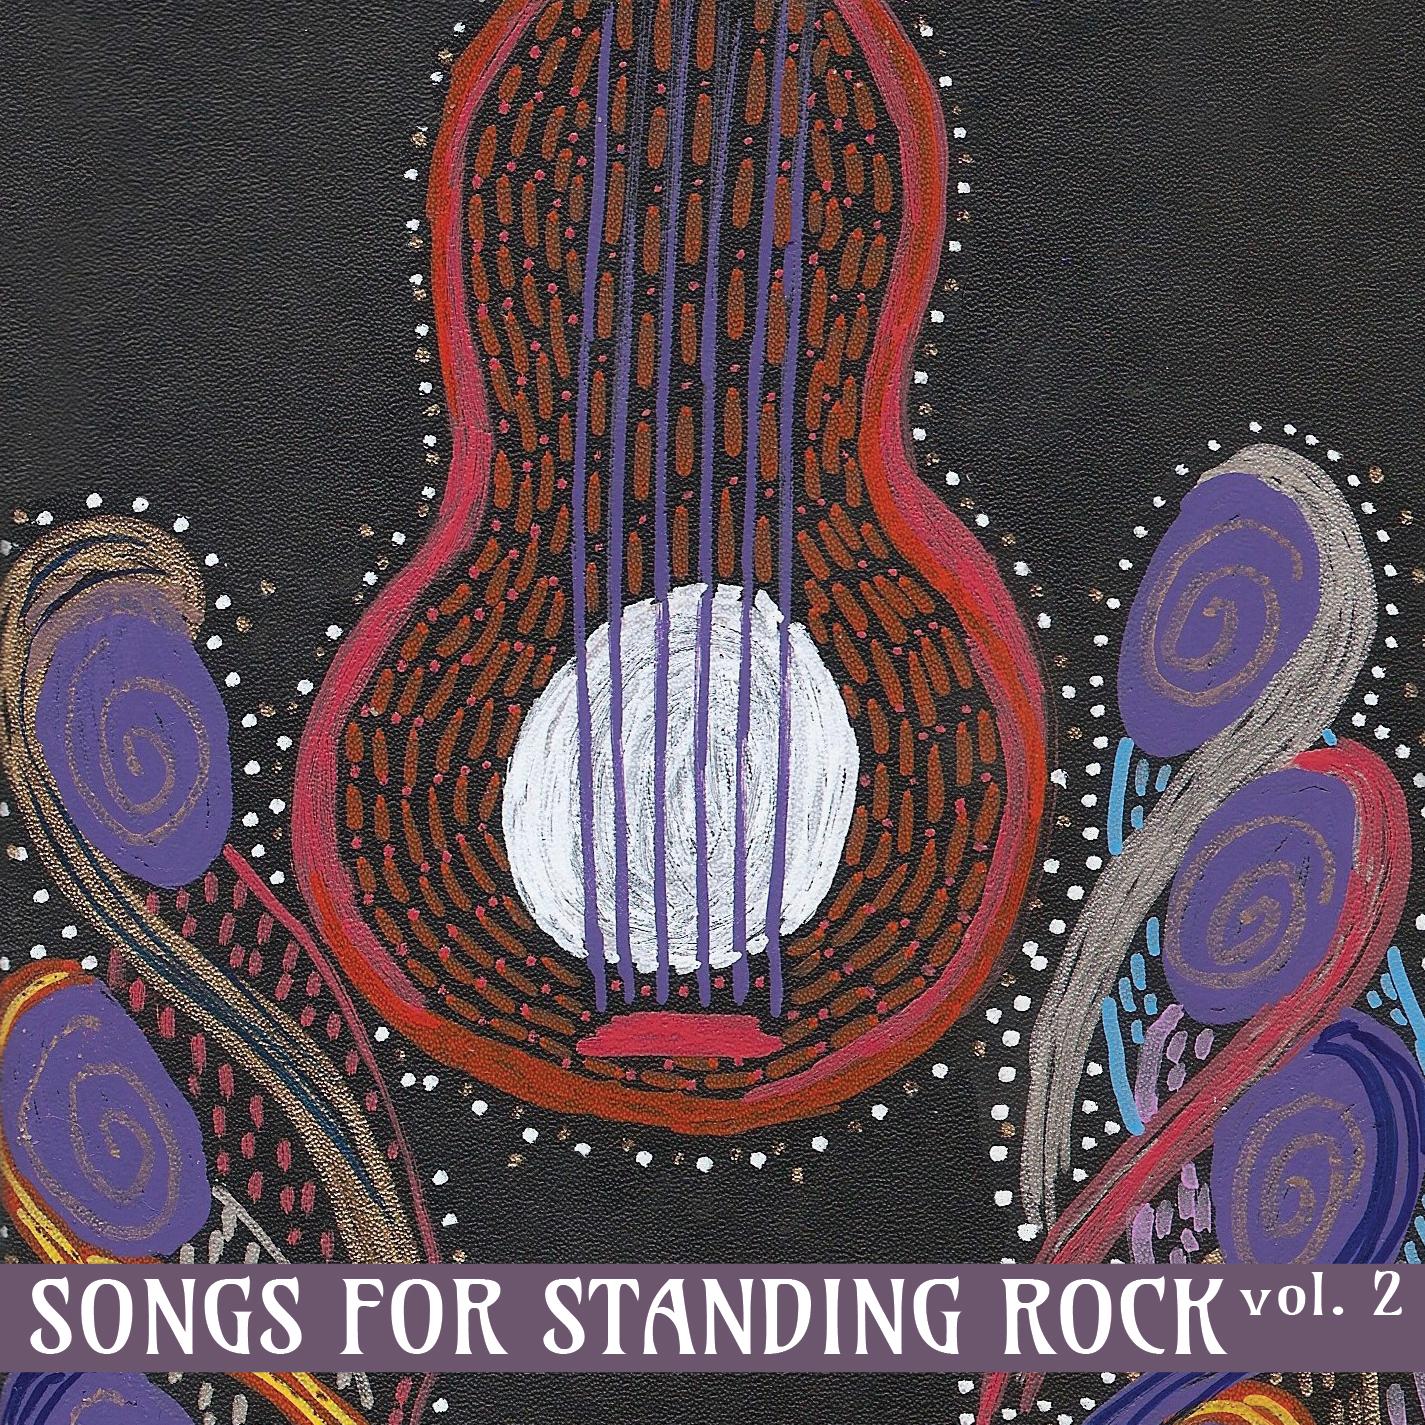 Songs for Standing Rock Vol. 2_cover-01.jpg